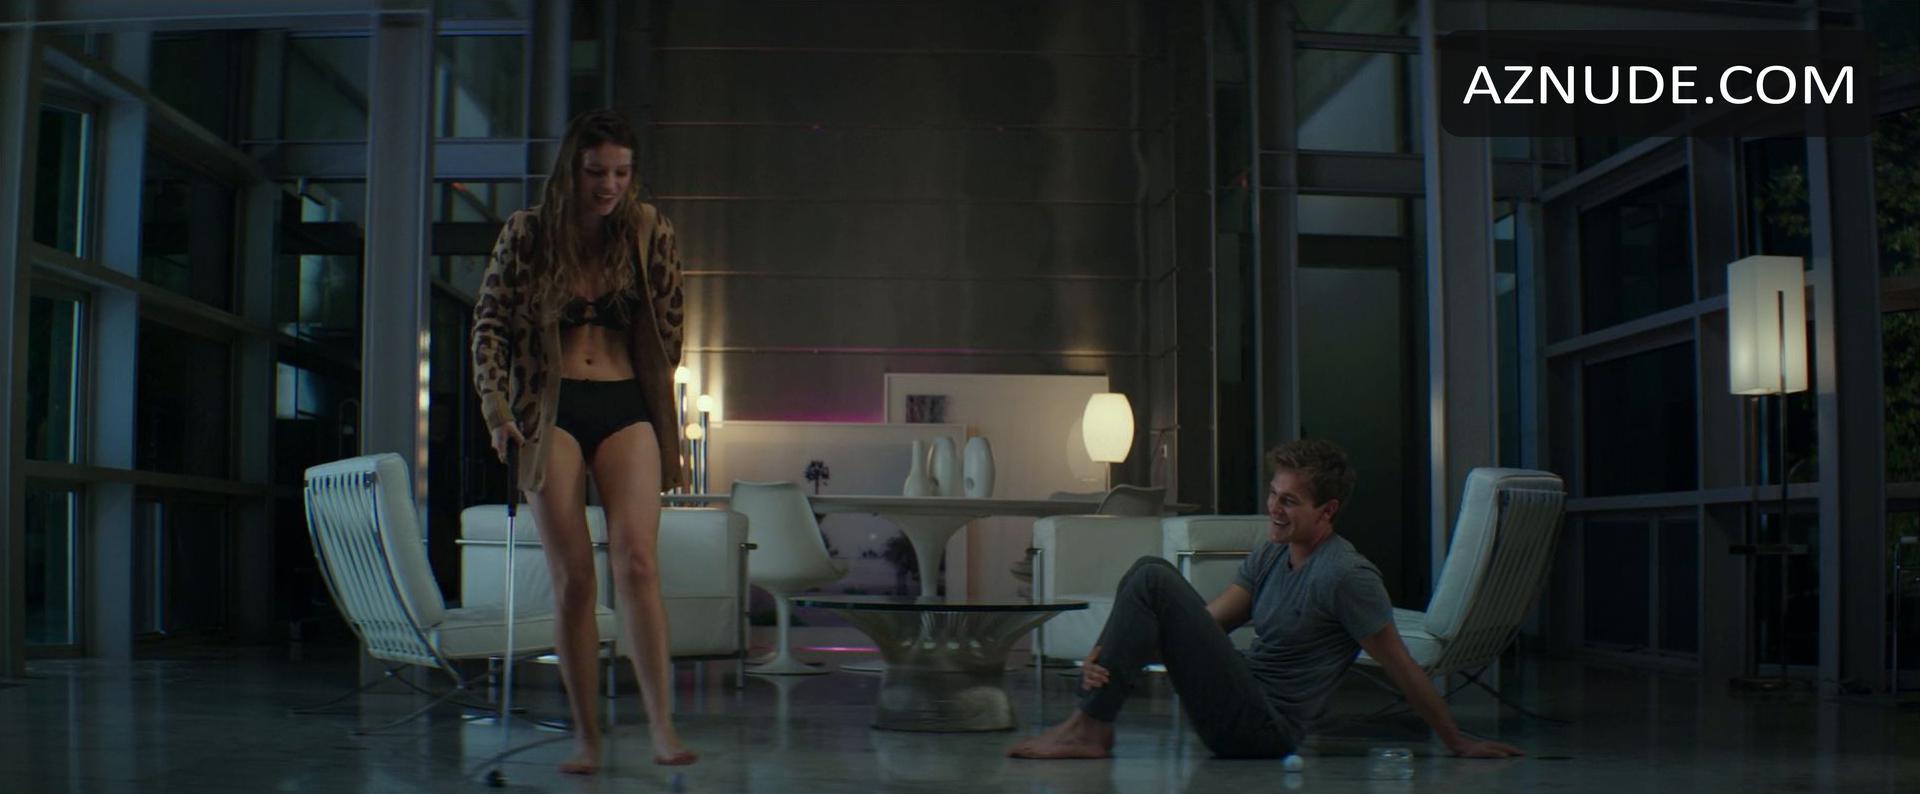 image Bella thorne nude scene in snapchat story scandalplanetcom